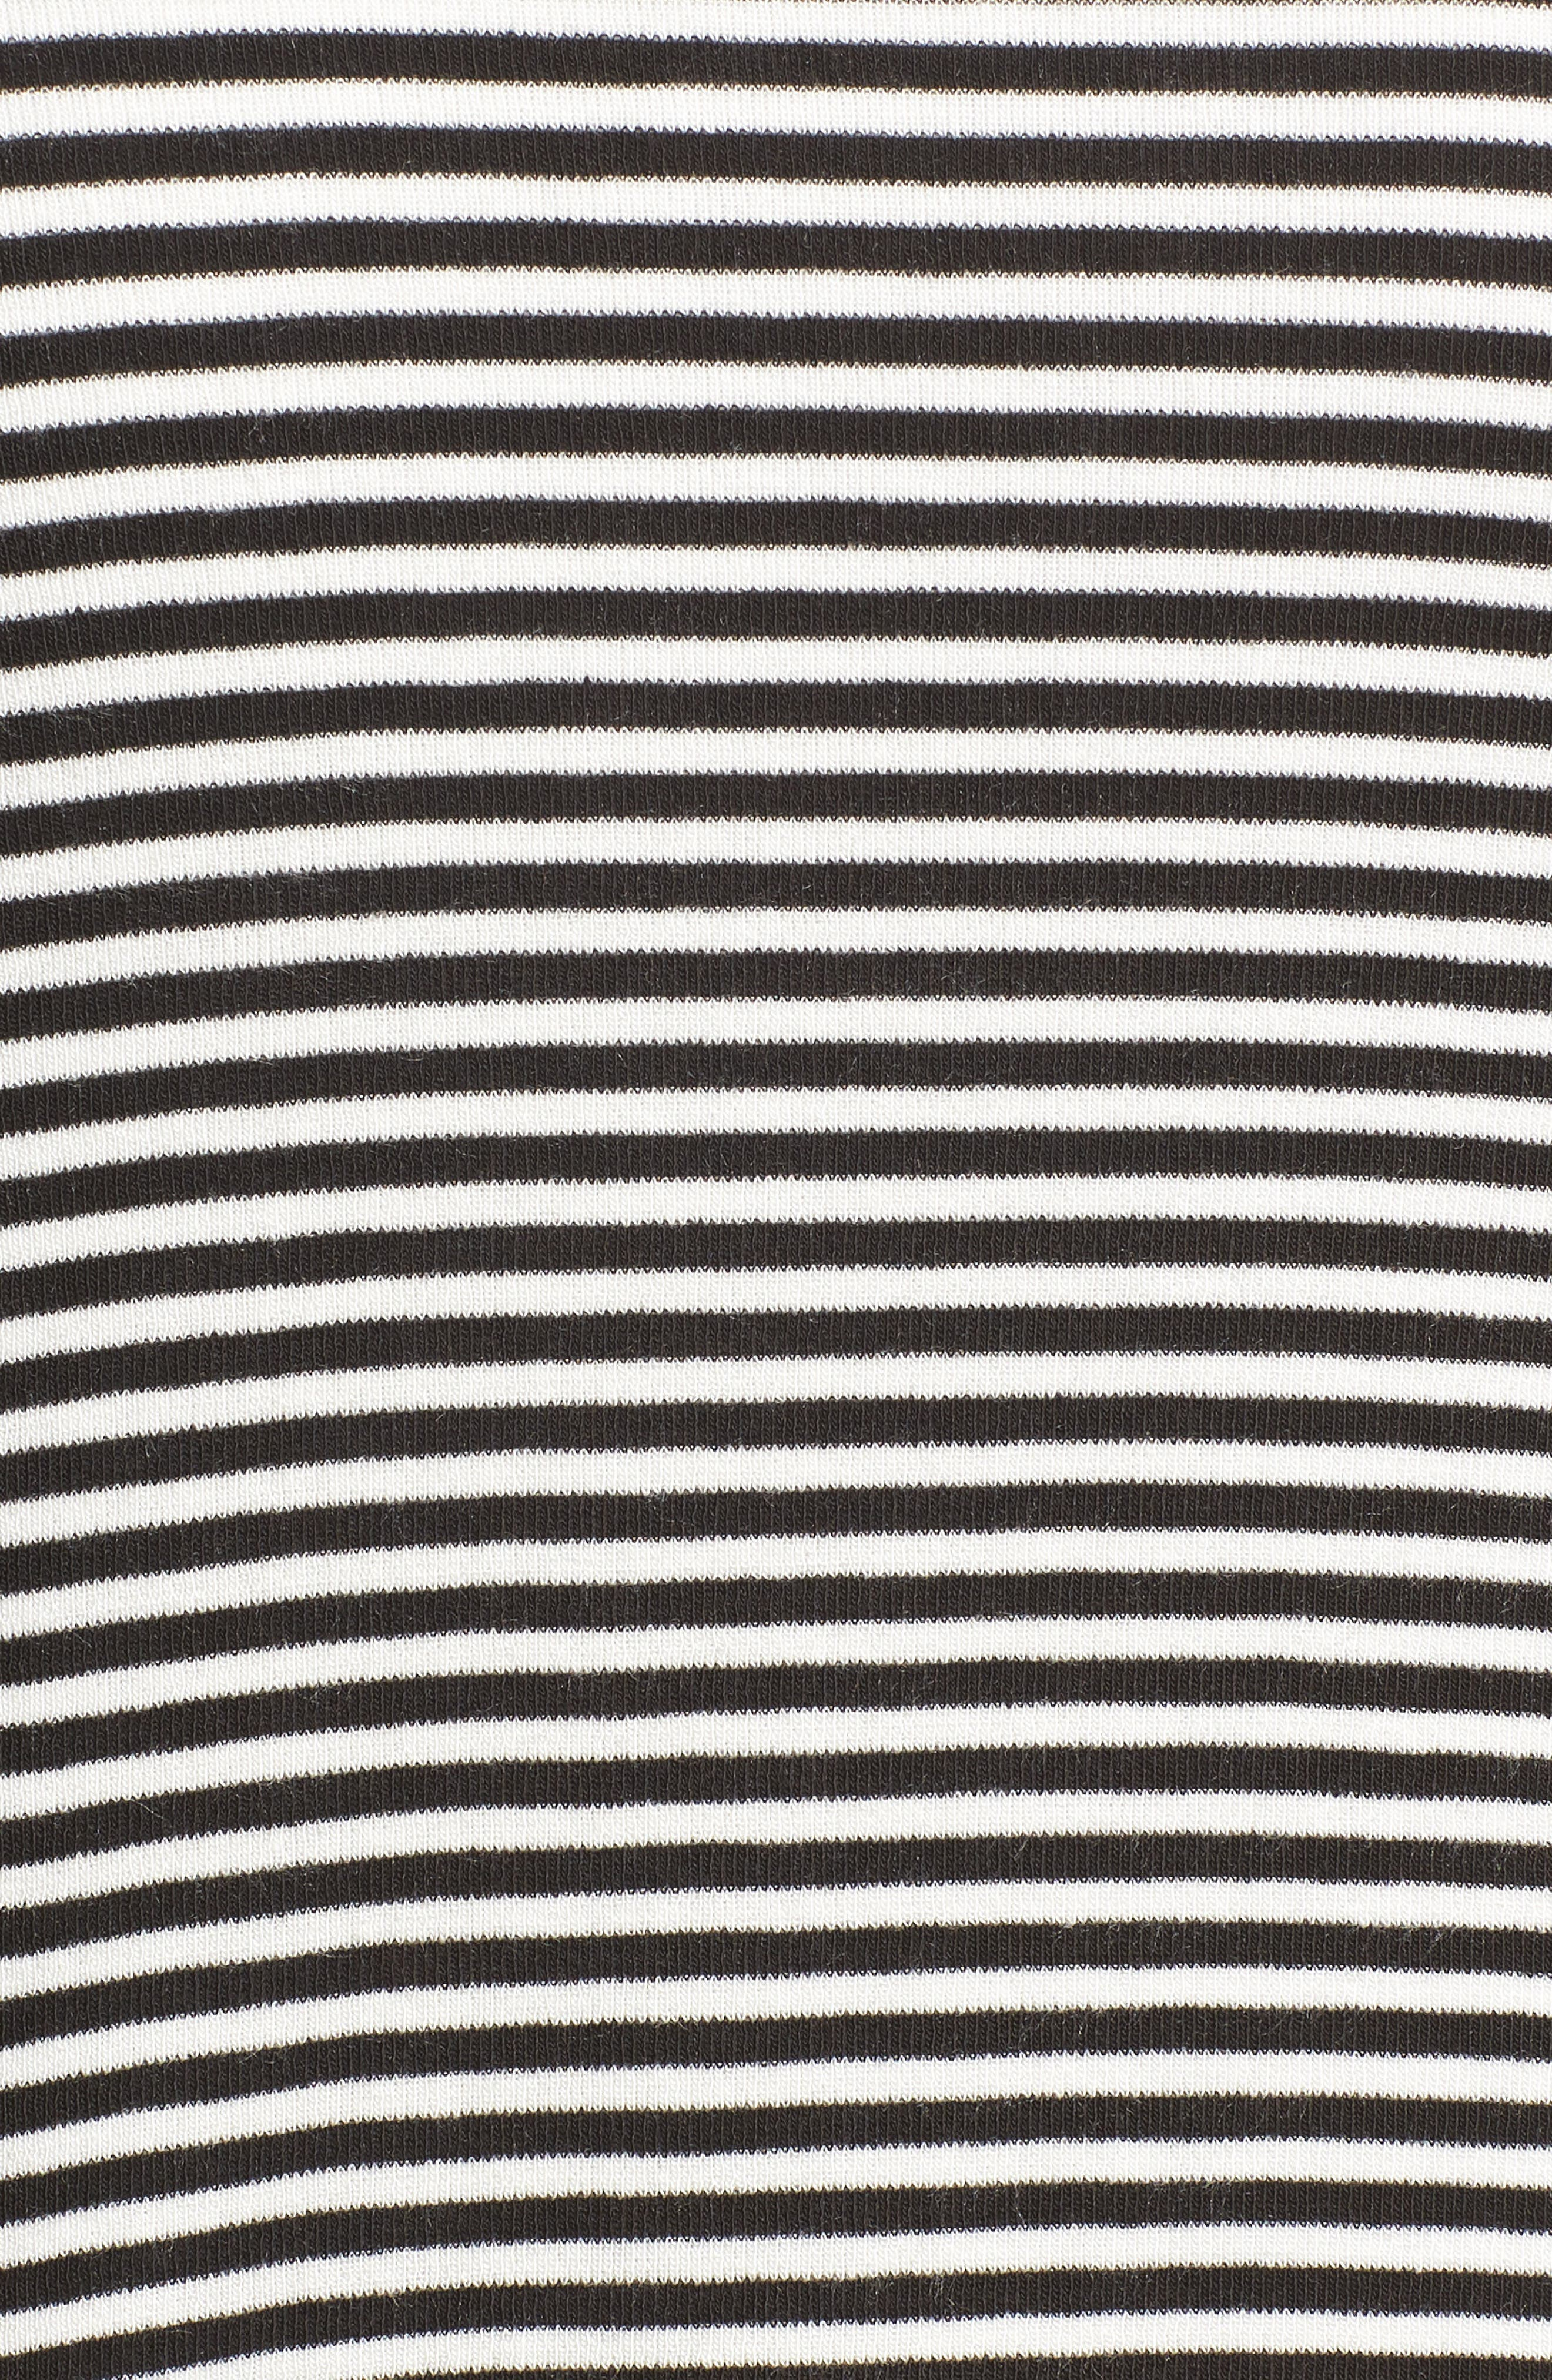 Ruched Sleeve Cardigan,                             Alternate thumbnail 6, color,                             Black/ White Stripe